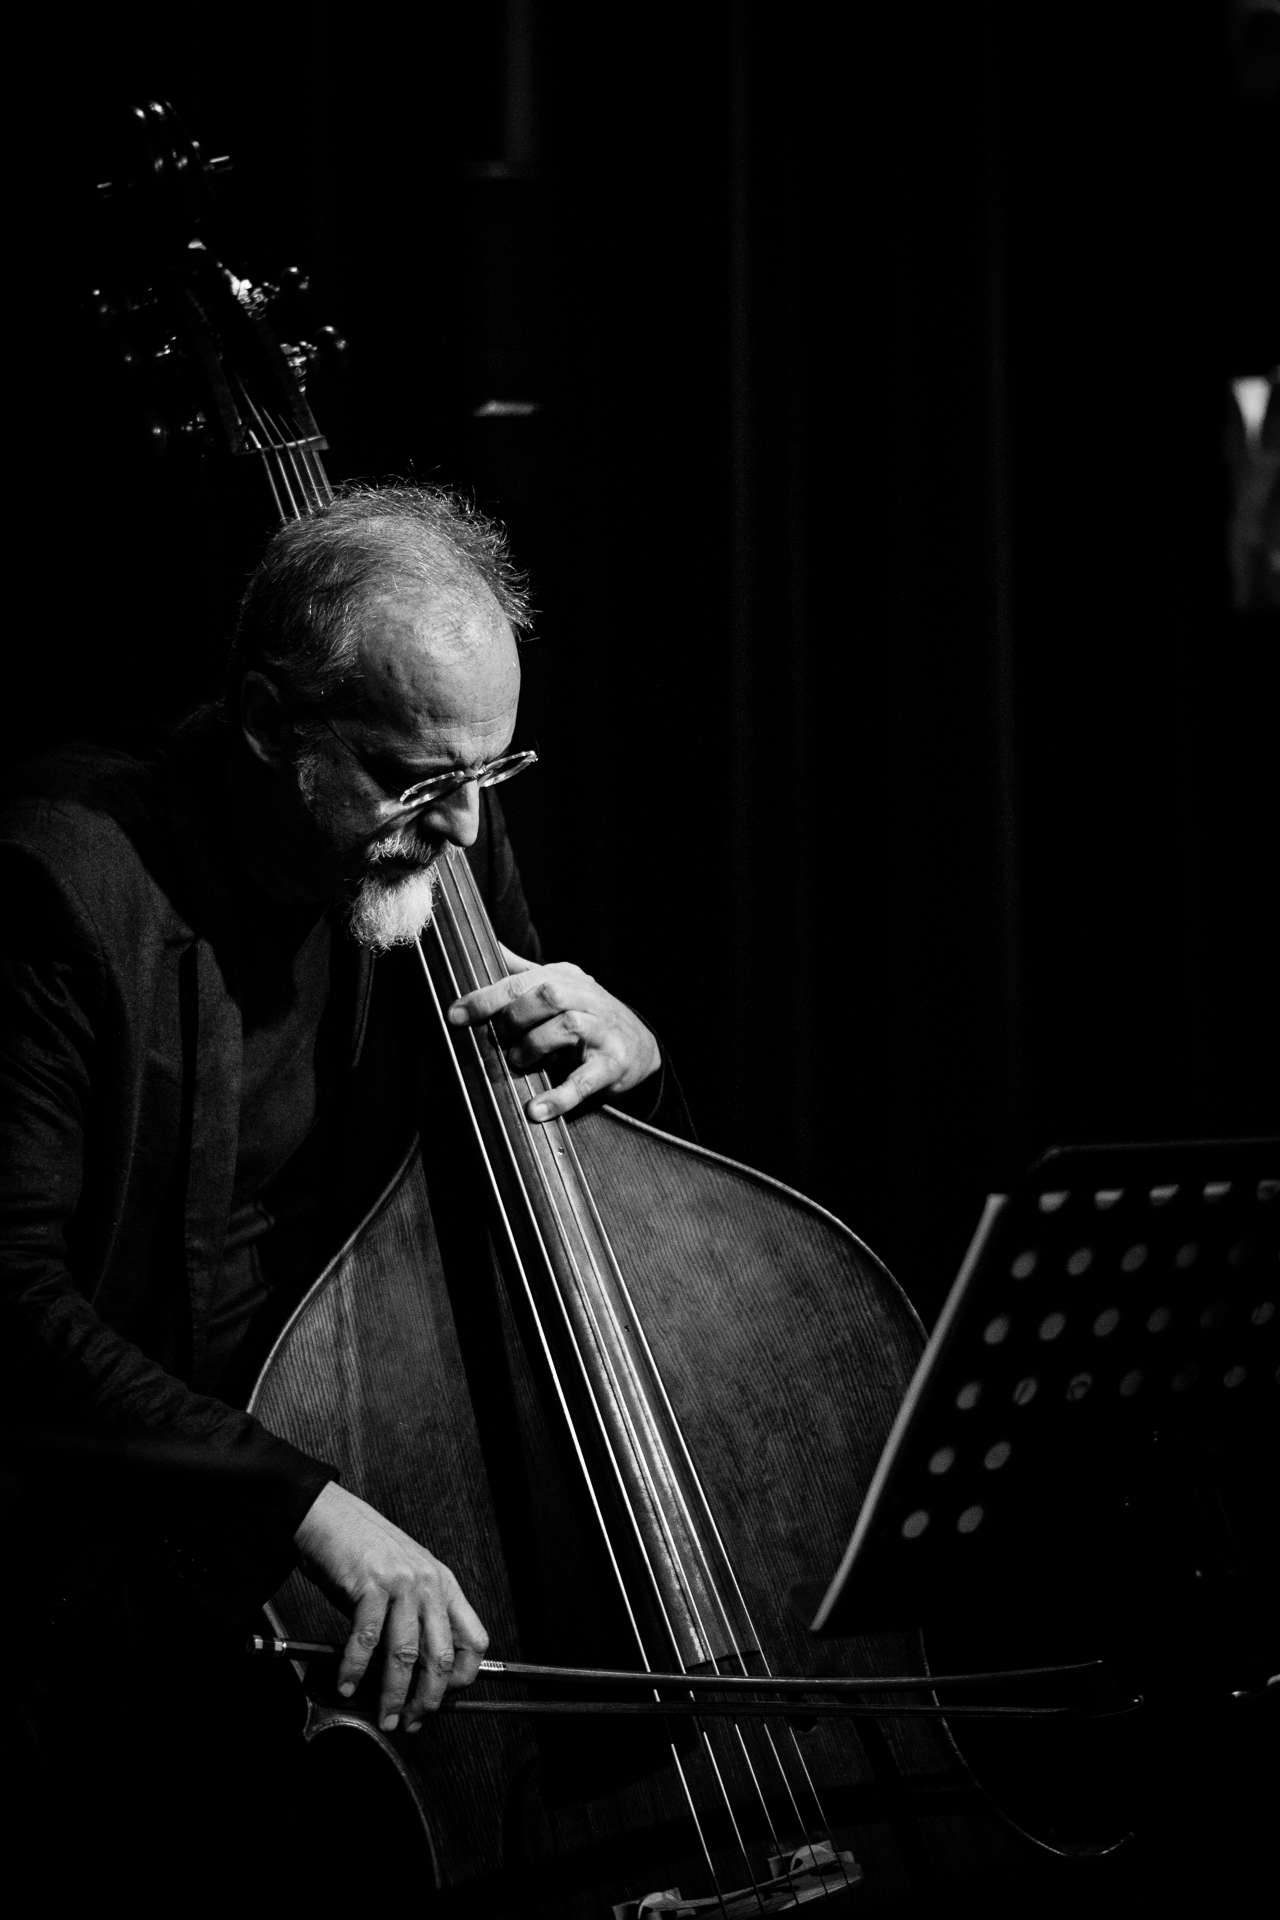 Stefano Dall'Ora, Jazz in Bess, Lugano, 2018.